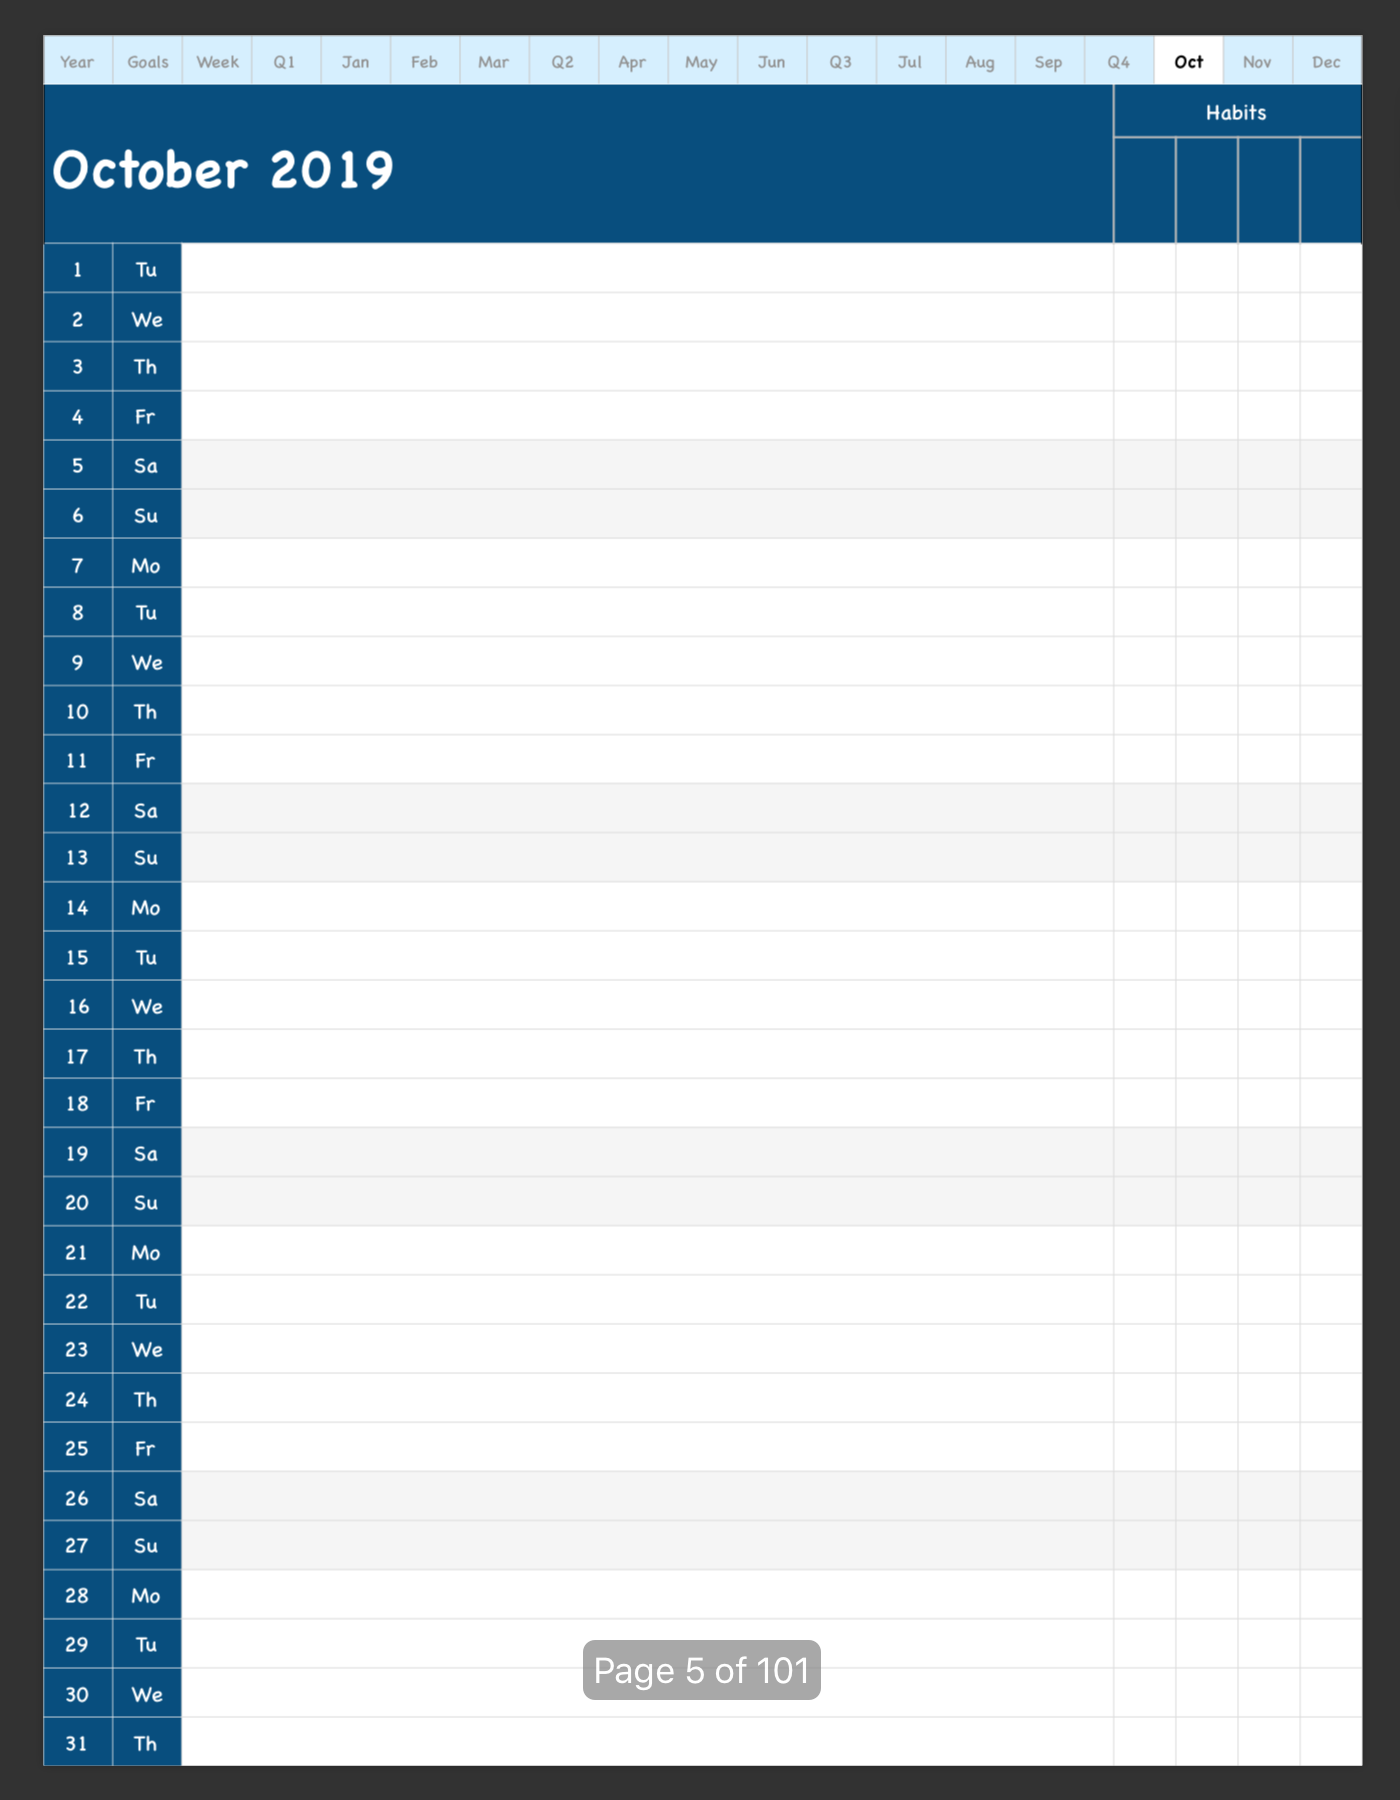 Screenshot 2019-10-01 11.35.29.png